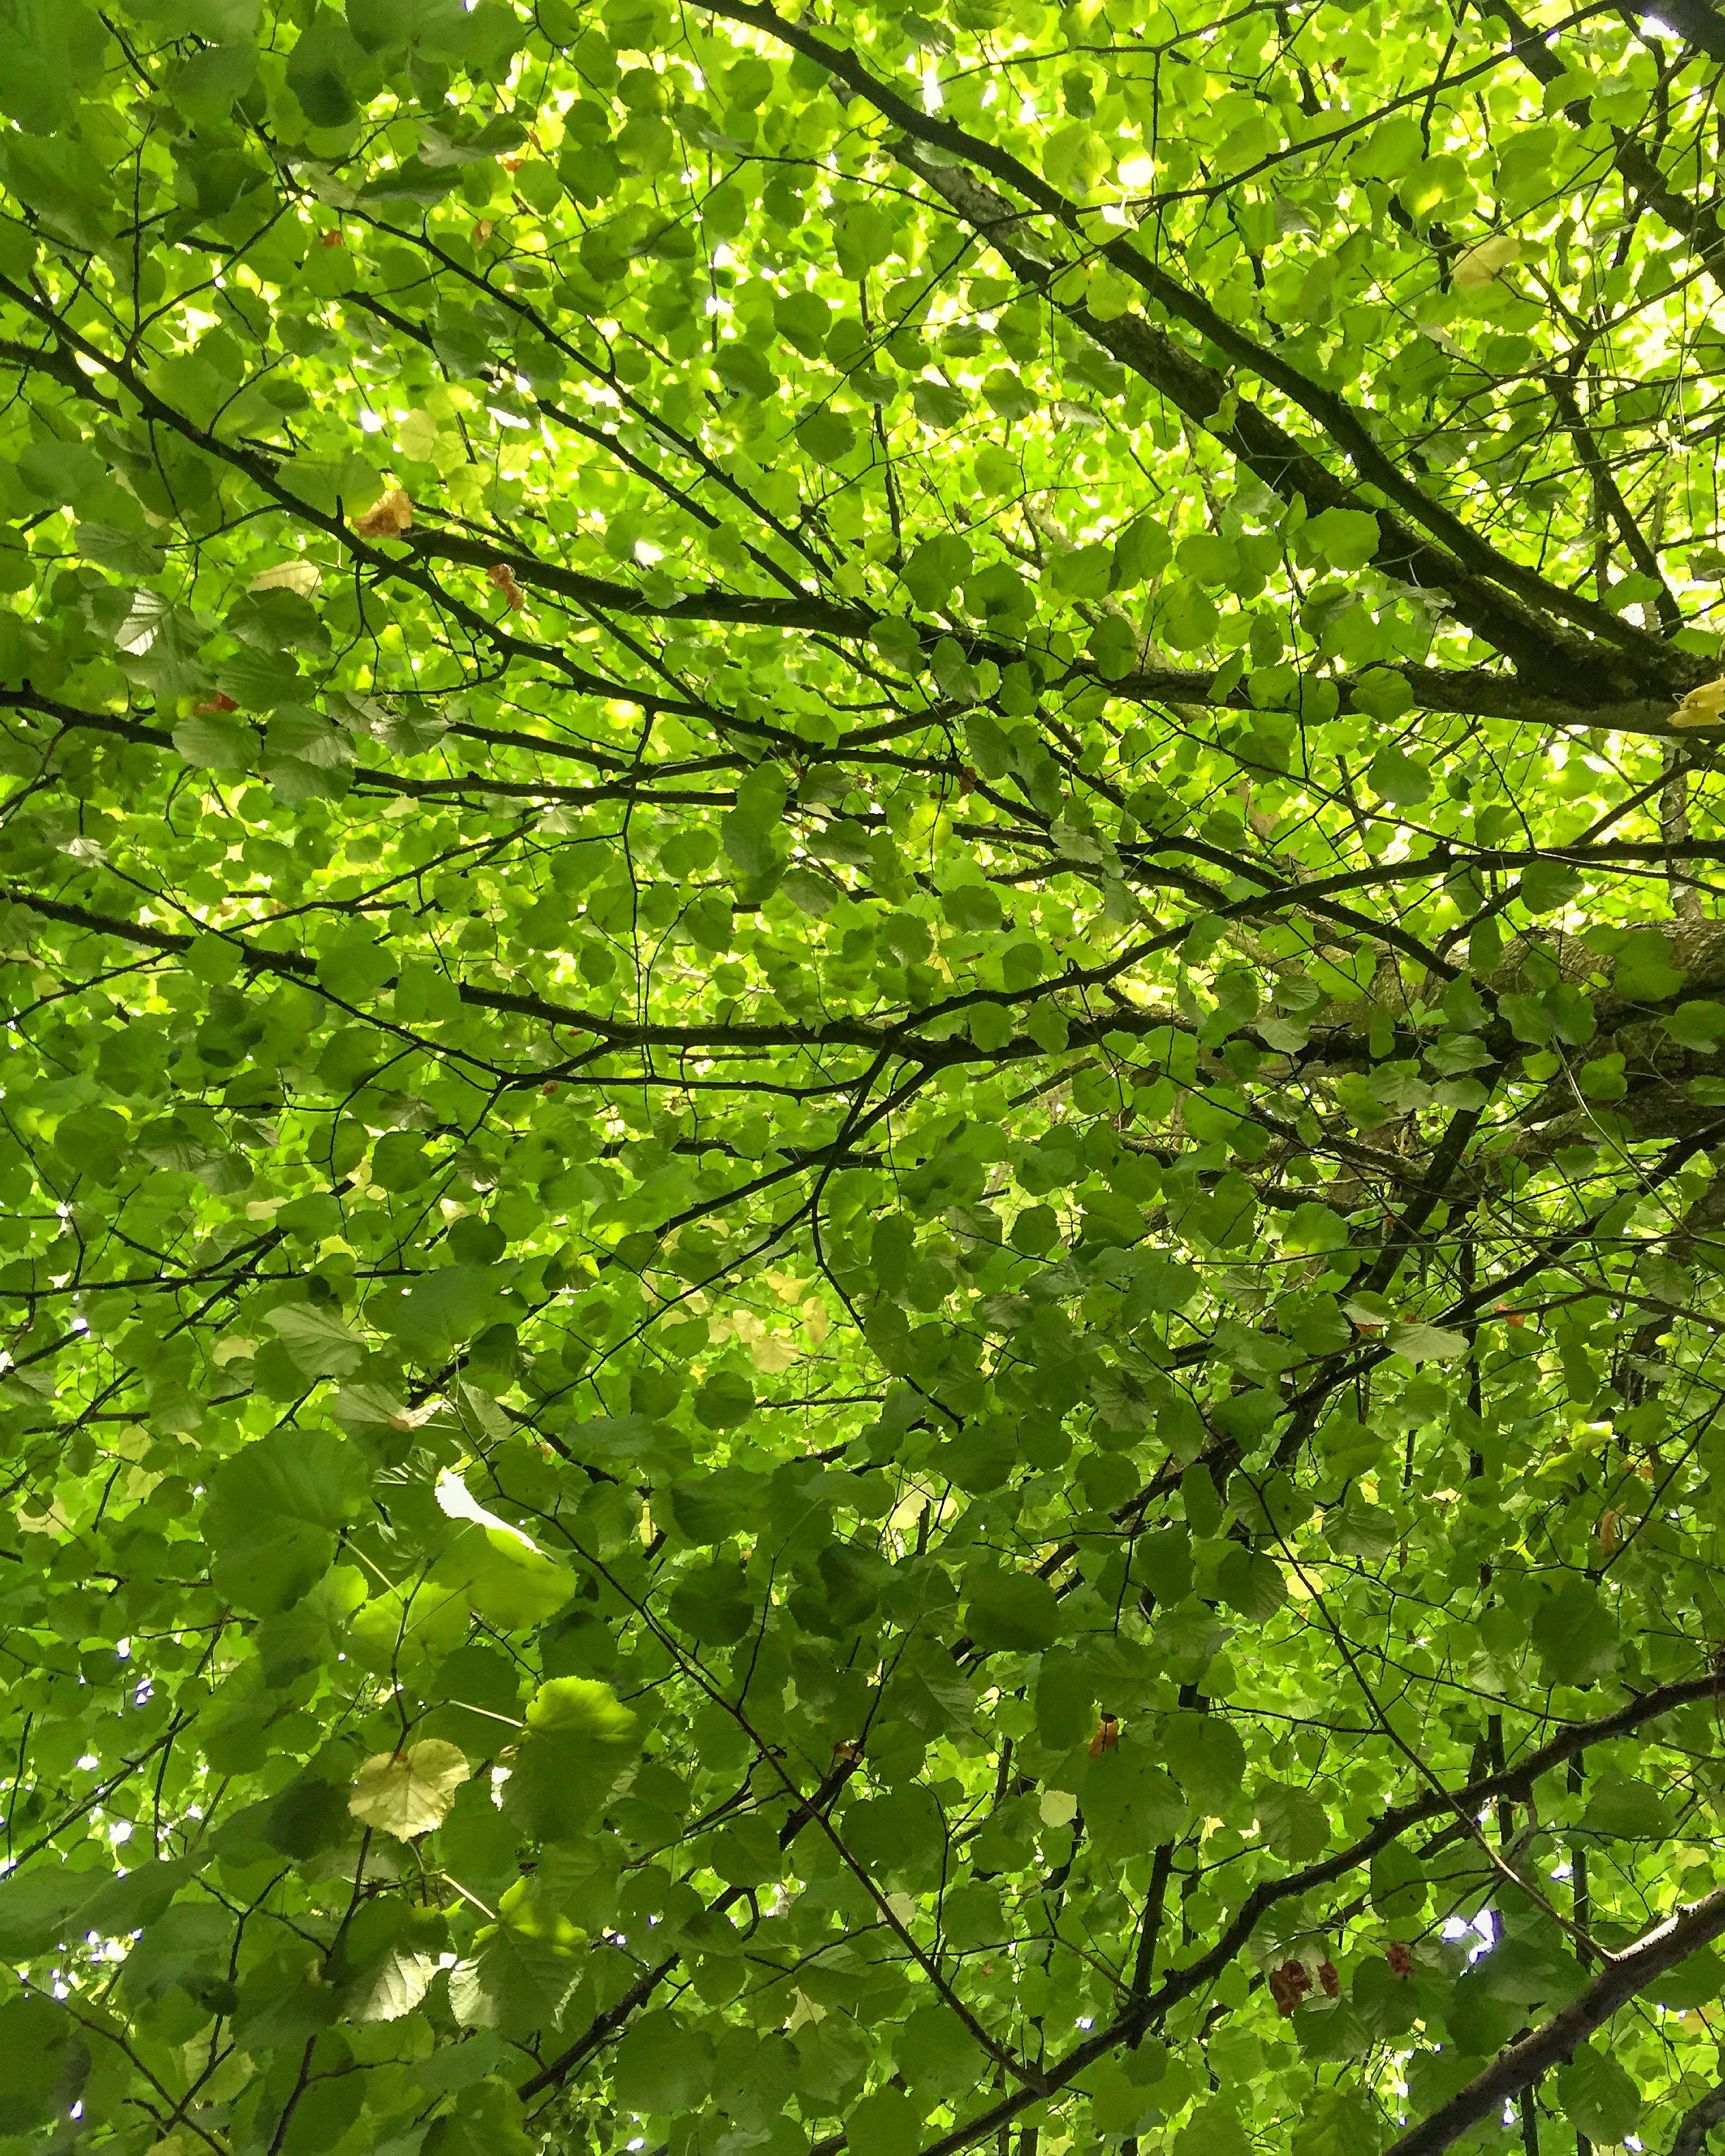 trees_Antrim_castle_gardens_antrim_northern_ireland_ni_explorer_niexplorer.jpg